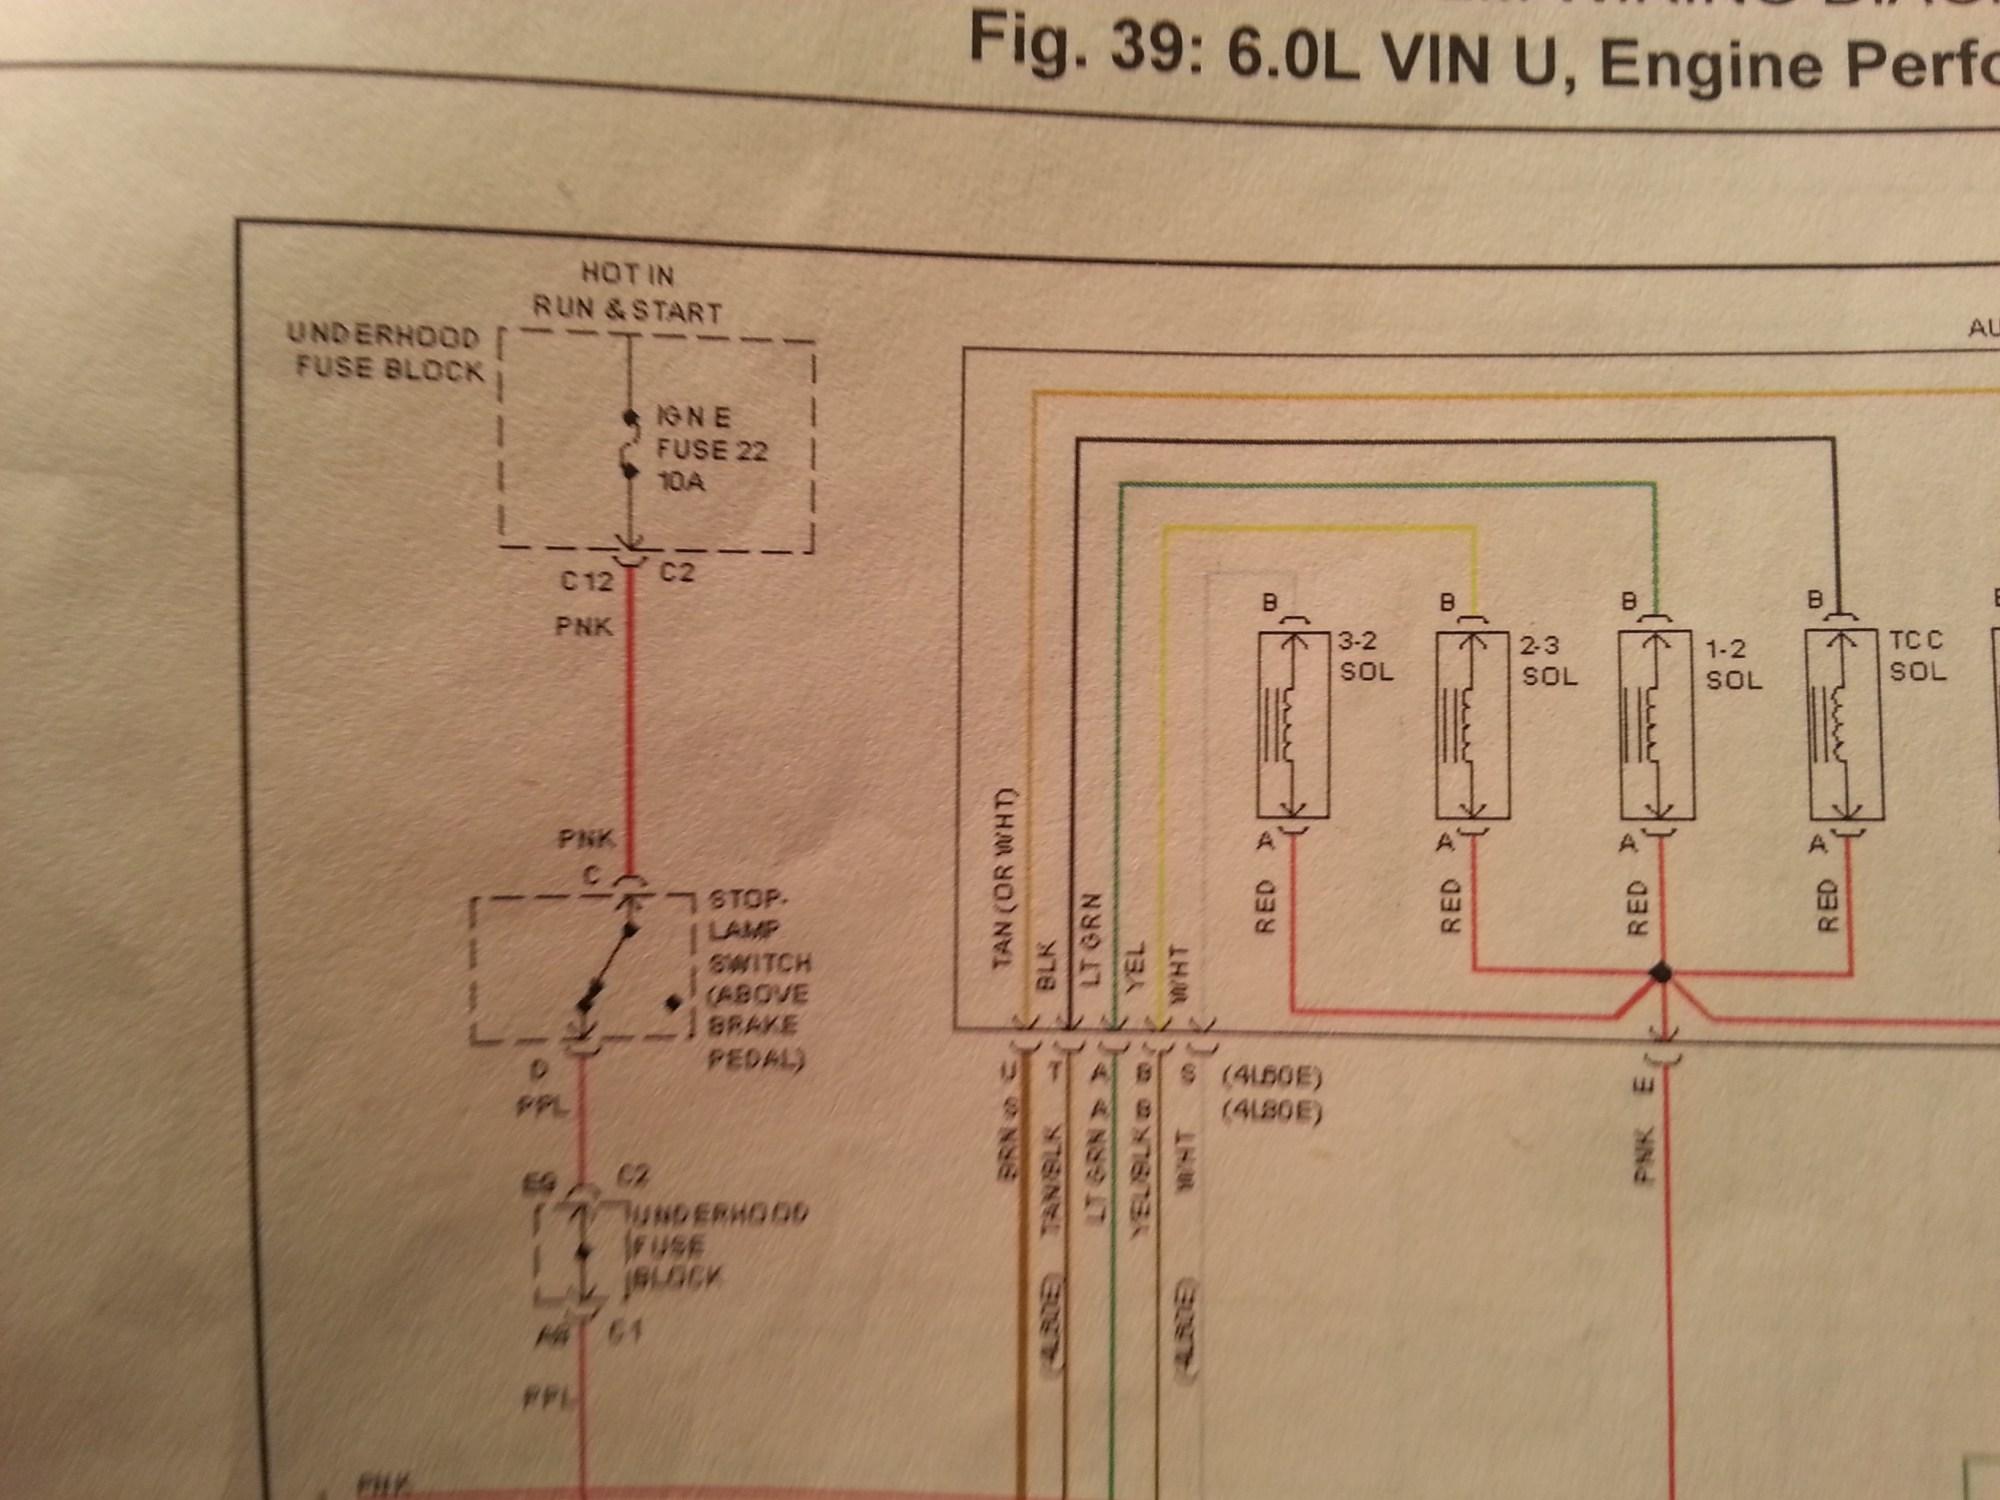 hight resolution of lq9 wiring diagram wiring diagram centre lq9 coil wiring diagram cruise control wiring lq9 ls1tech camaro